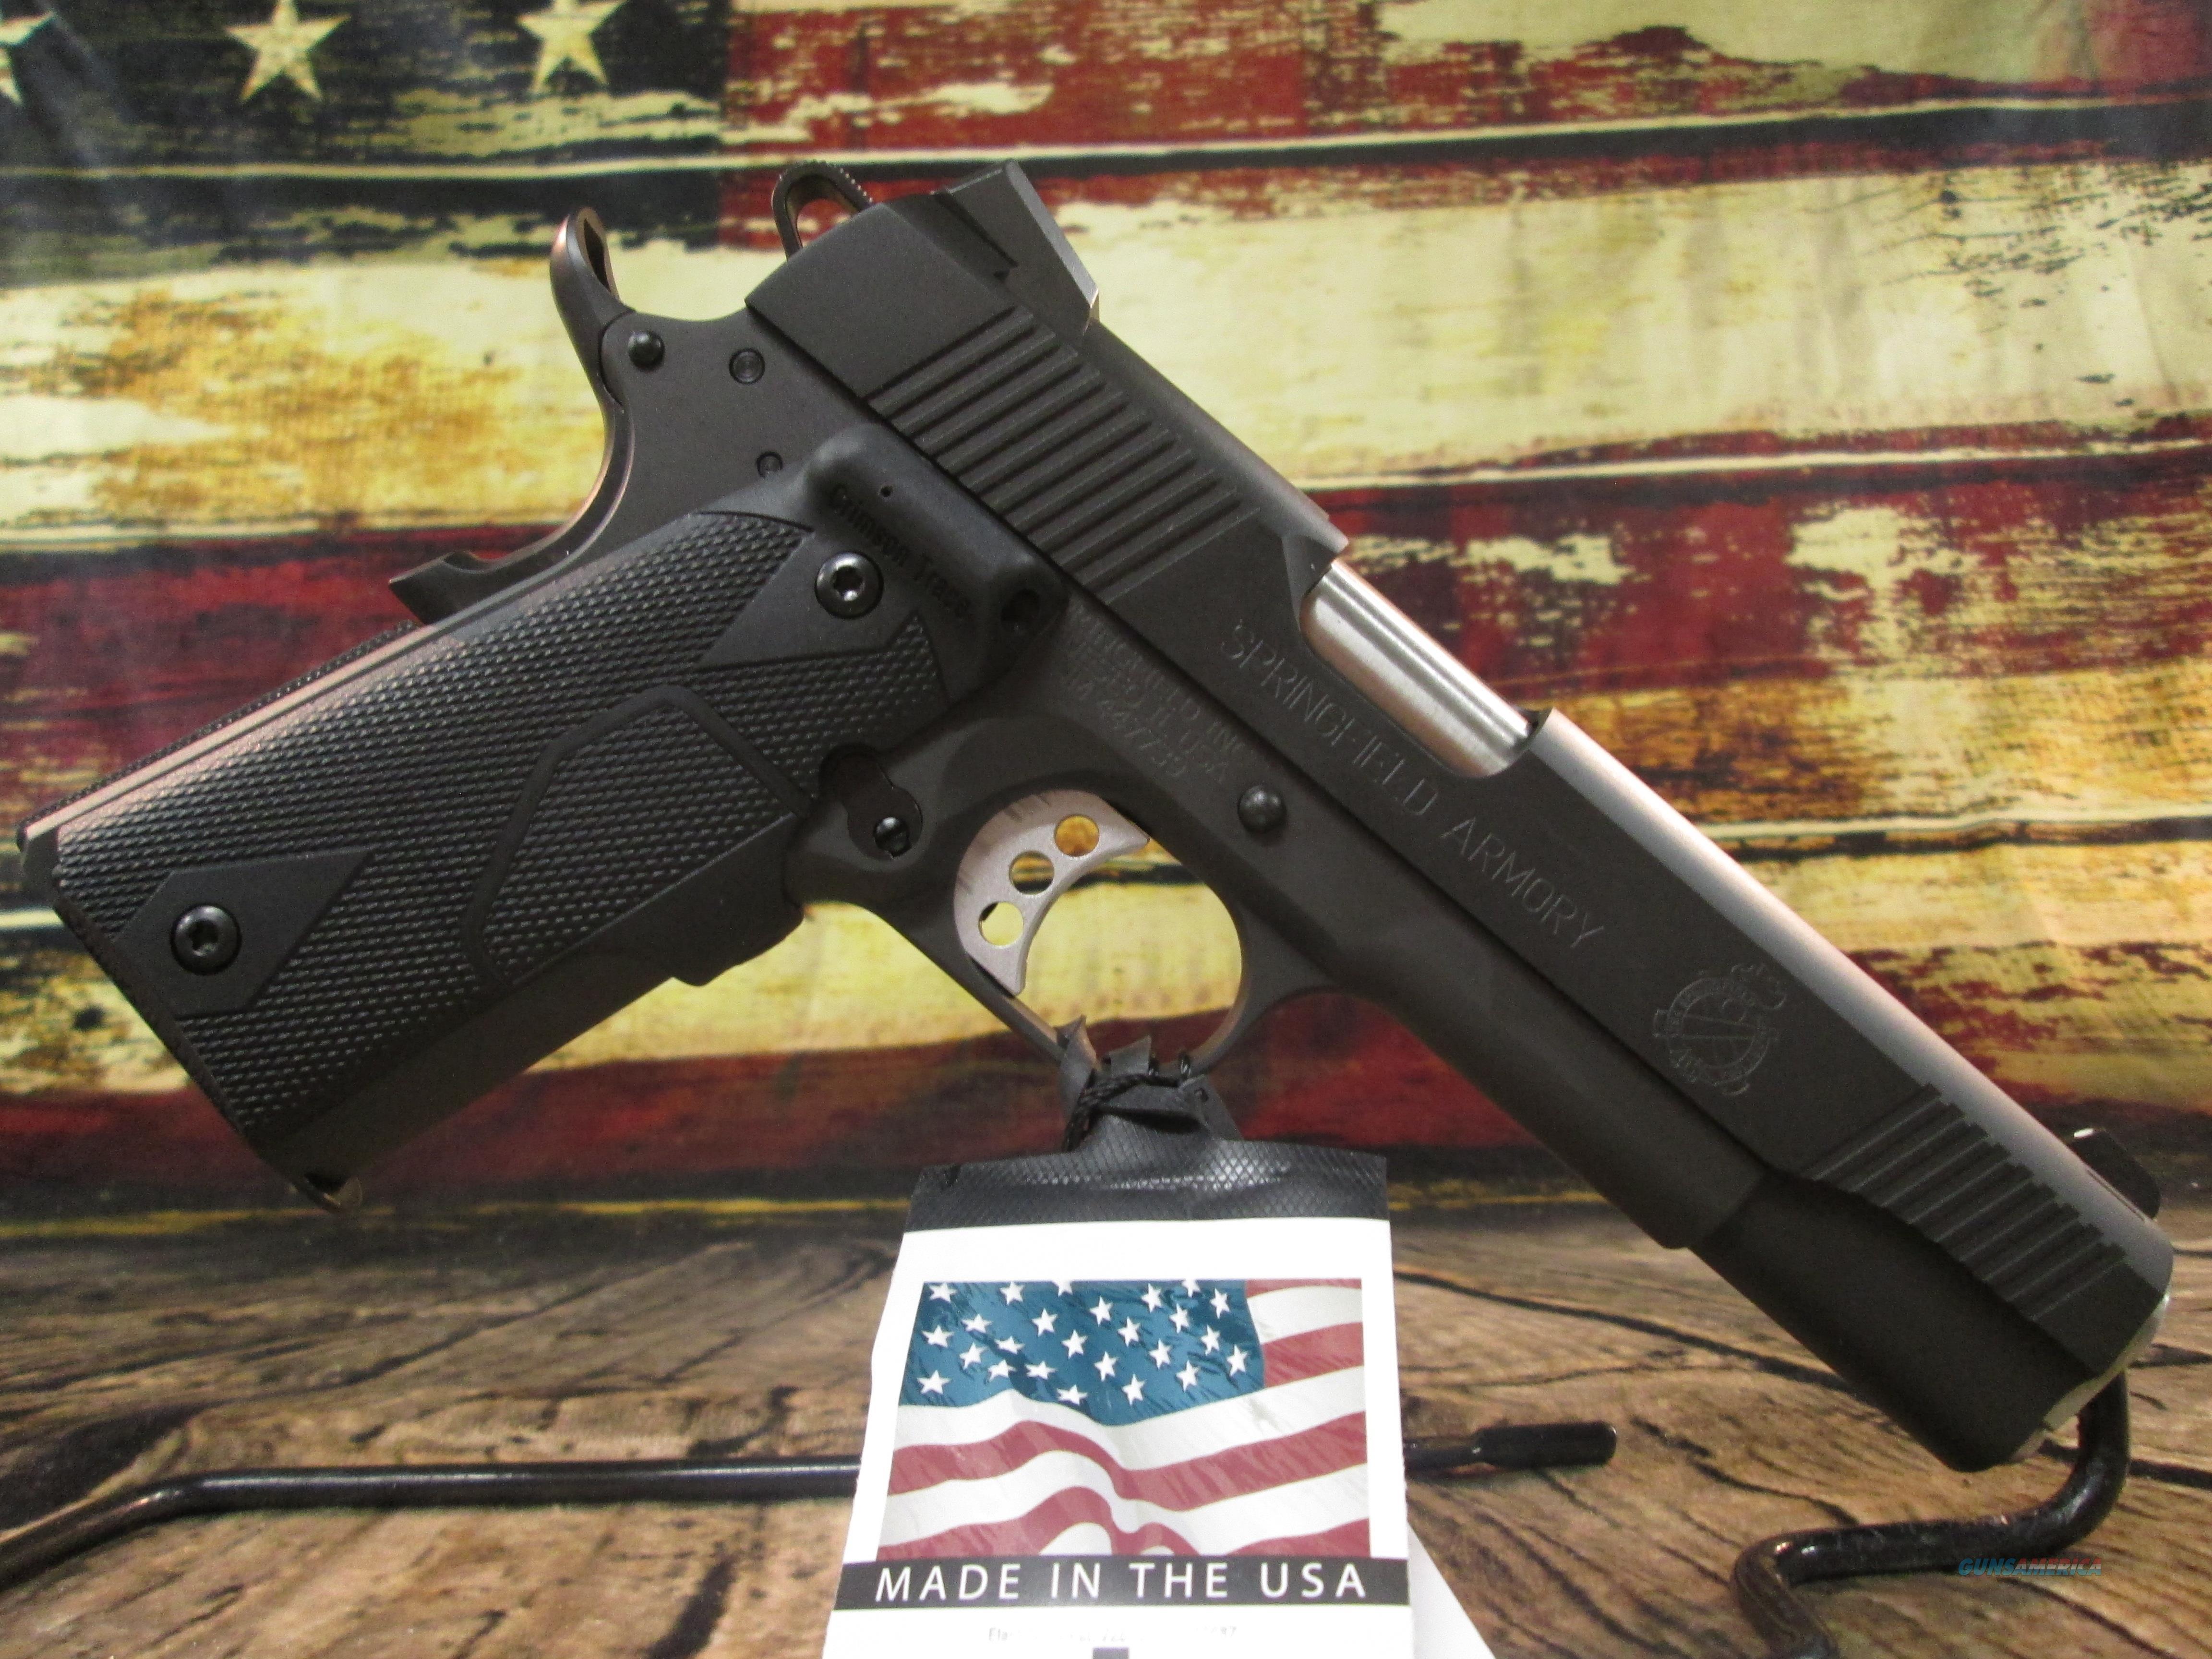 Springfield Armory 1911 Loaded W/ Crimson Trace 45 ACP (PI9109LPCT)  Guns > Pistols > Springfield Armory Pistols > 1911 Type